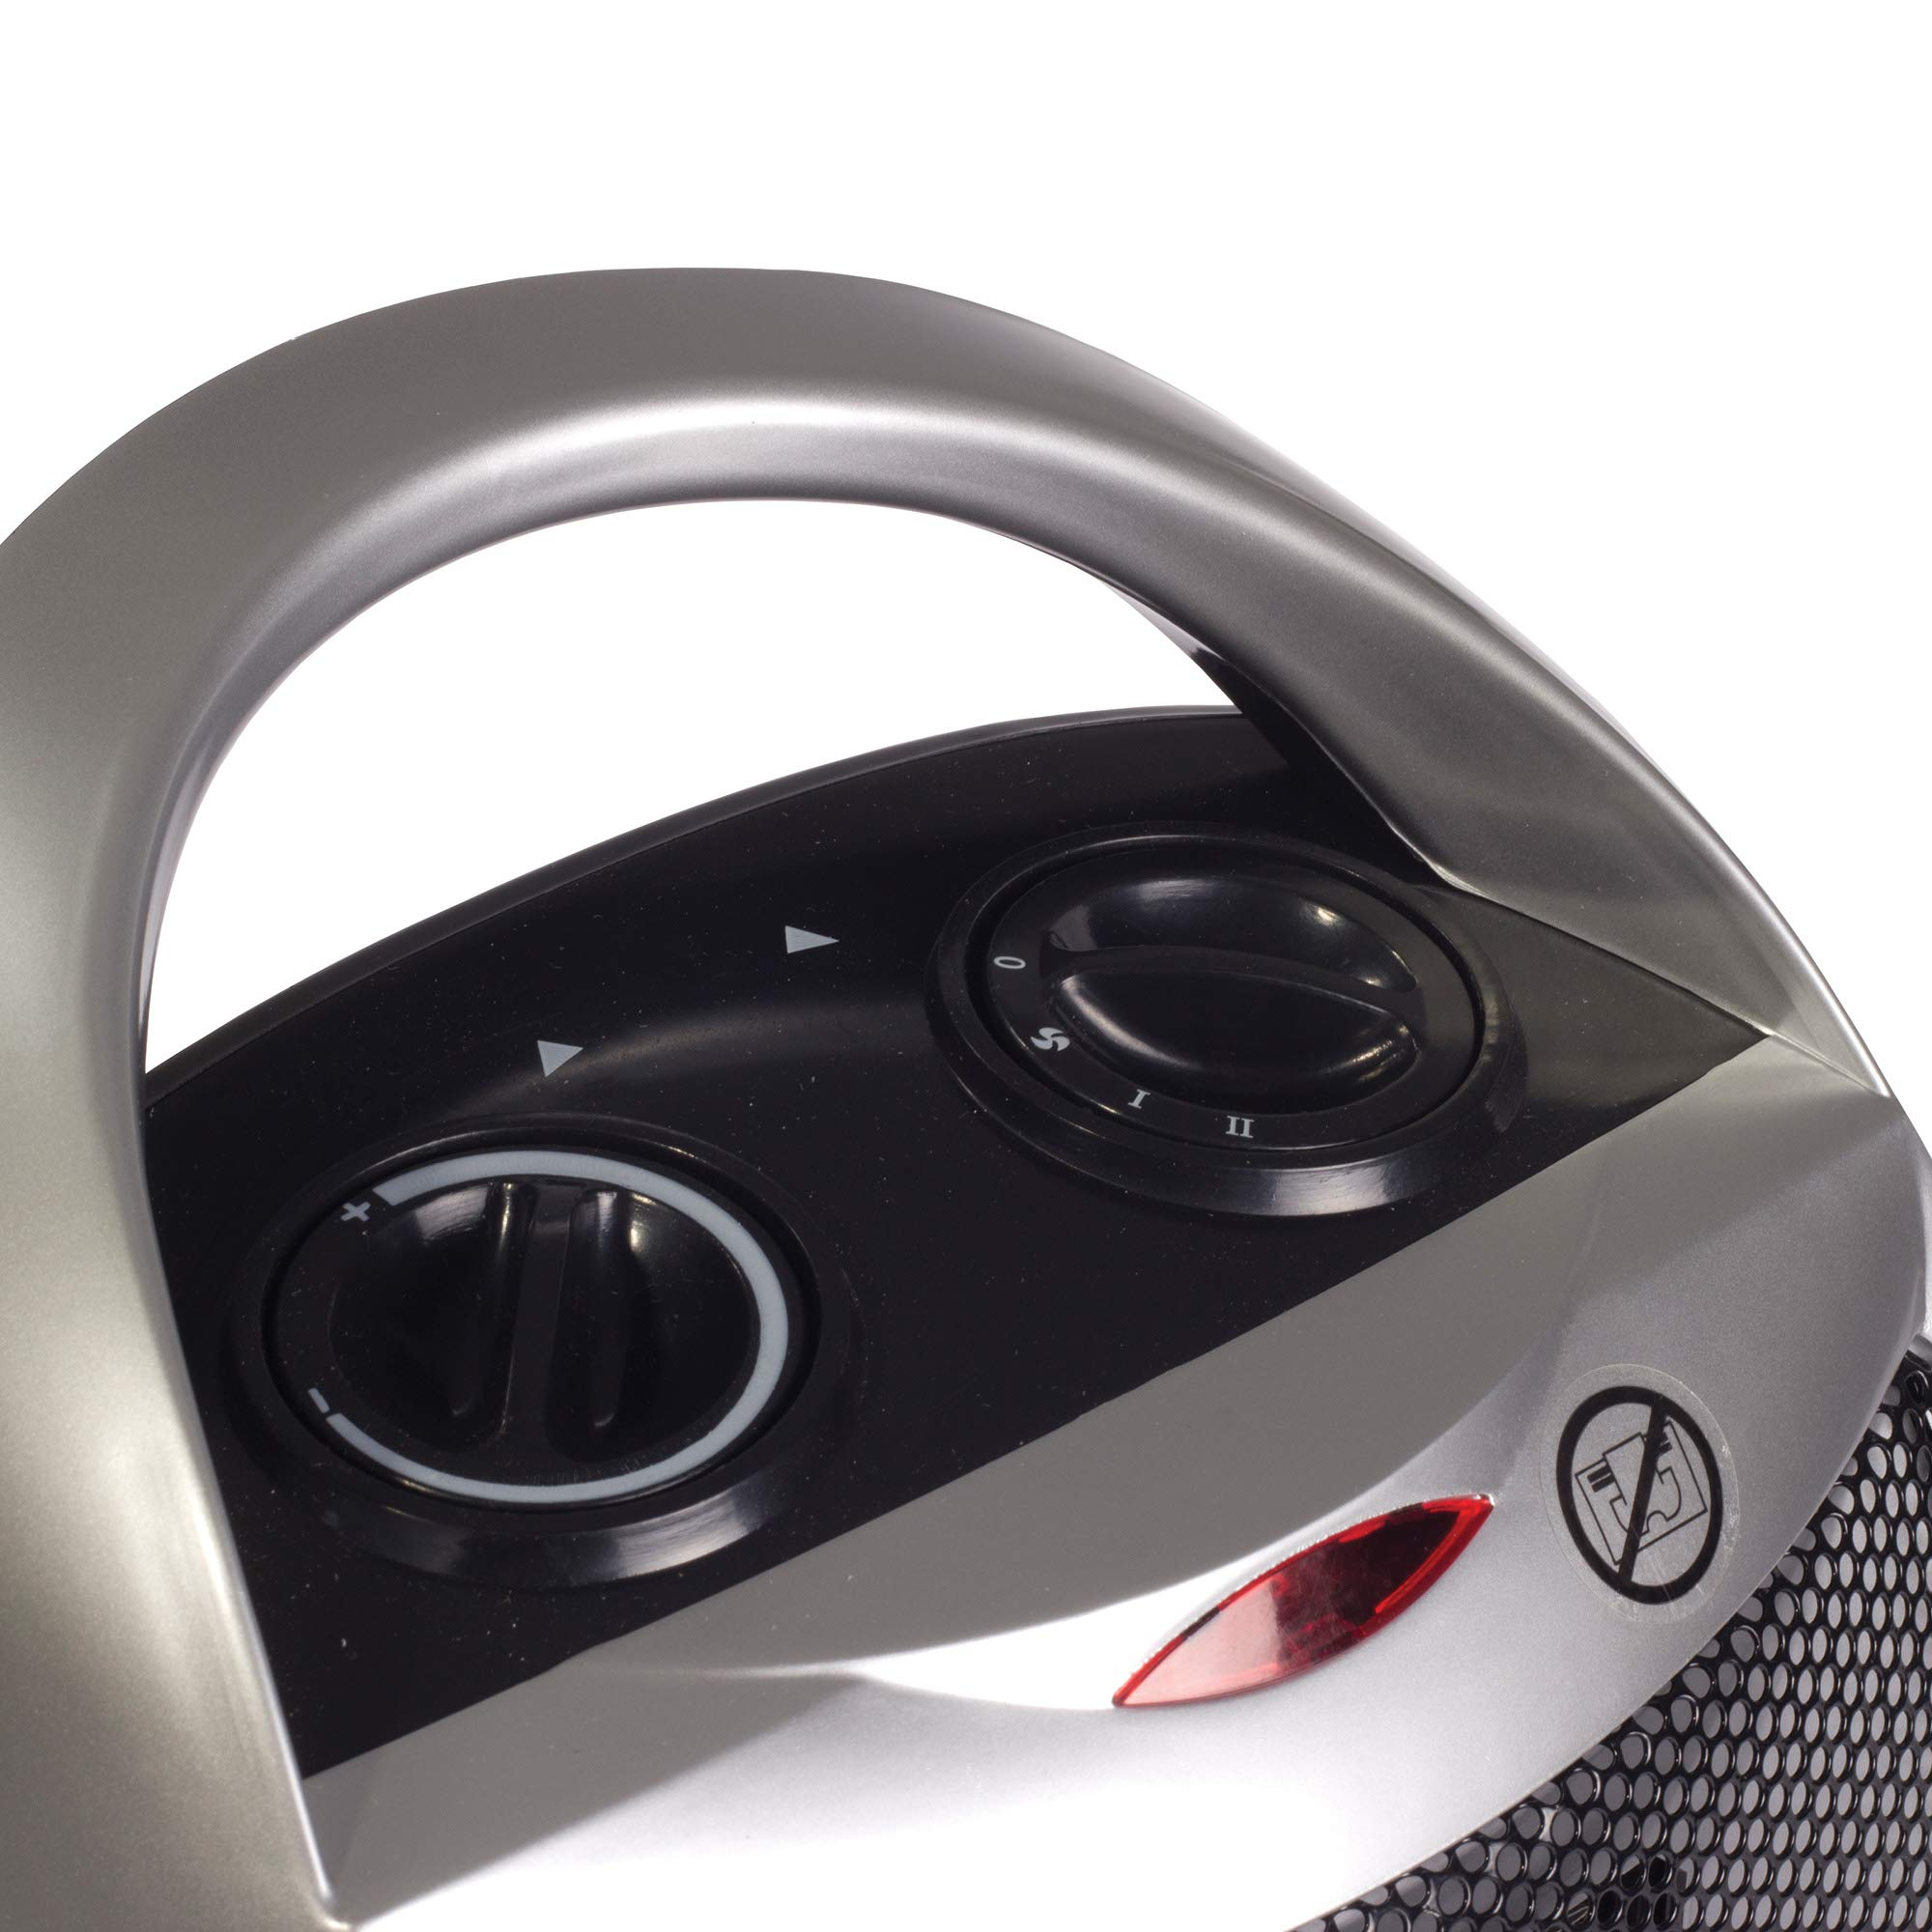 Cooolla Portable Ceramic Electric Fan